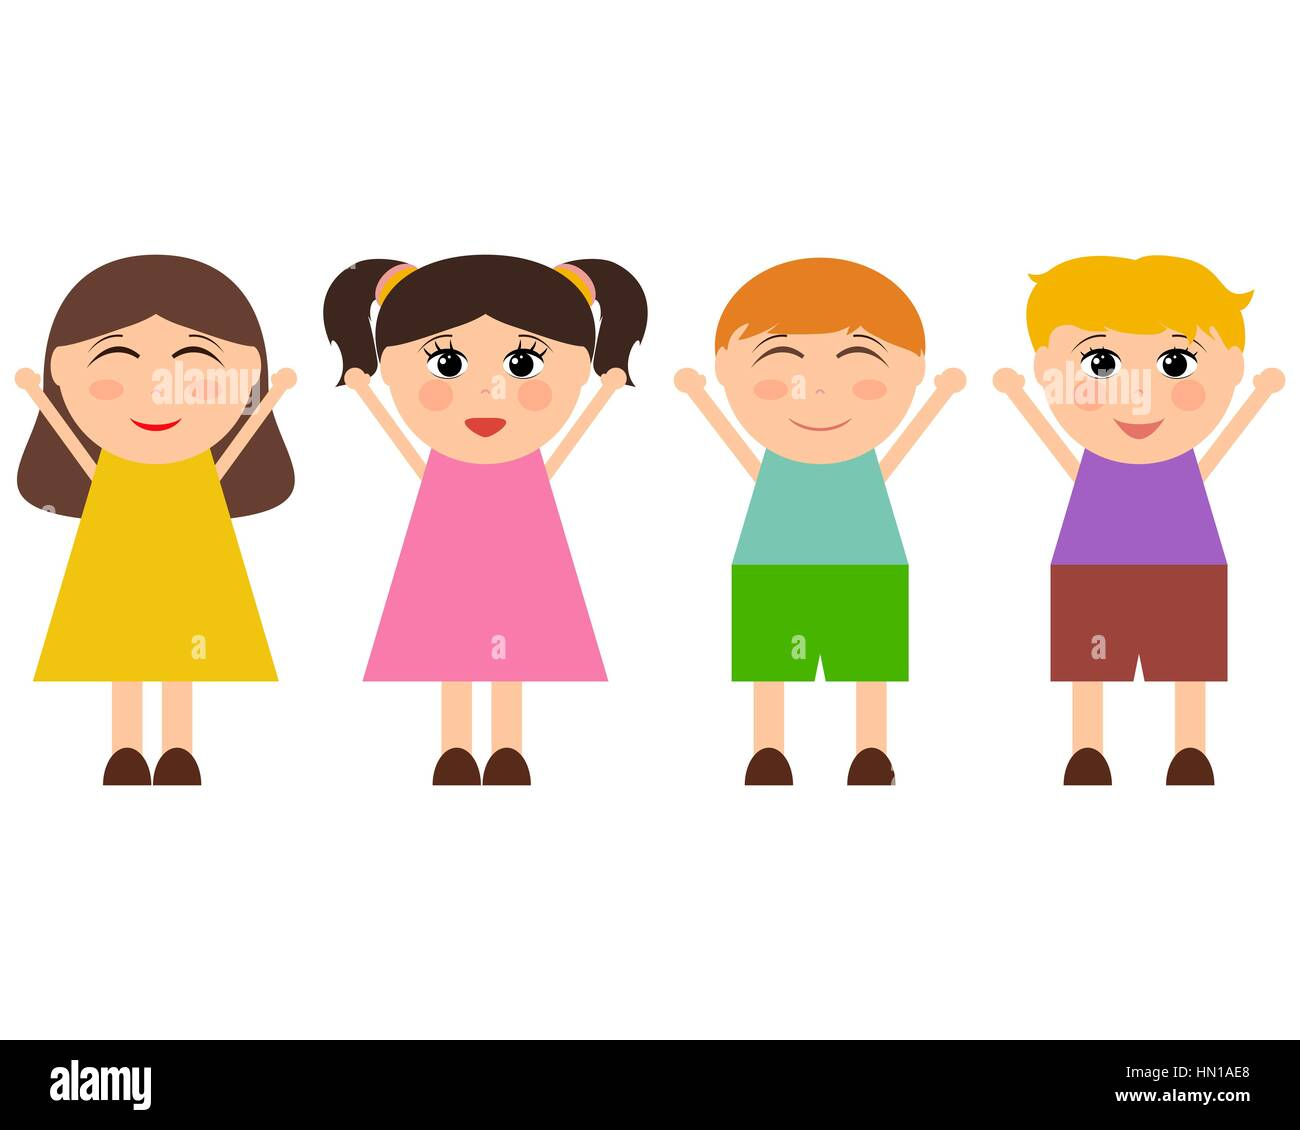 Funny Cartoon Images Of Boys cartoon funny girls and boys stock vector art & illustration